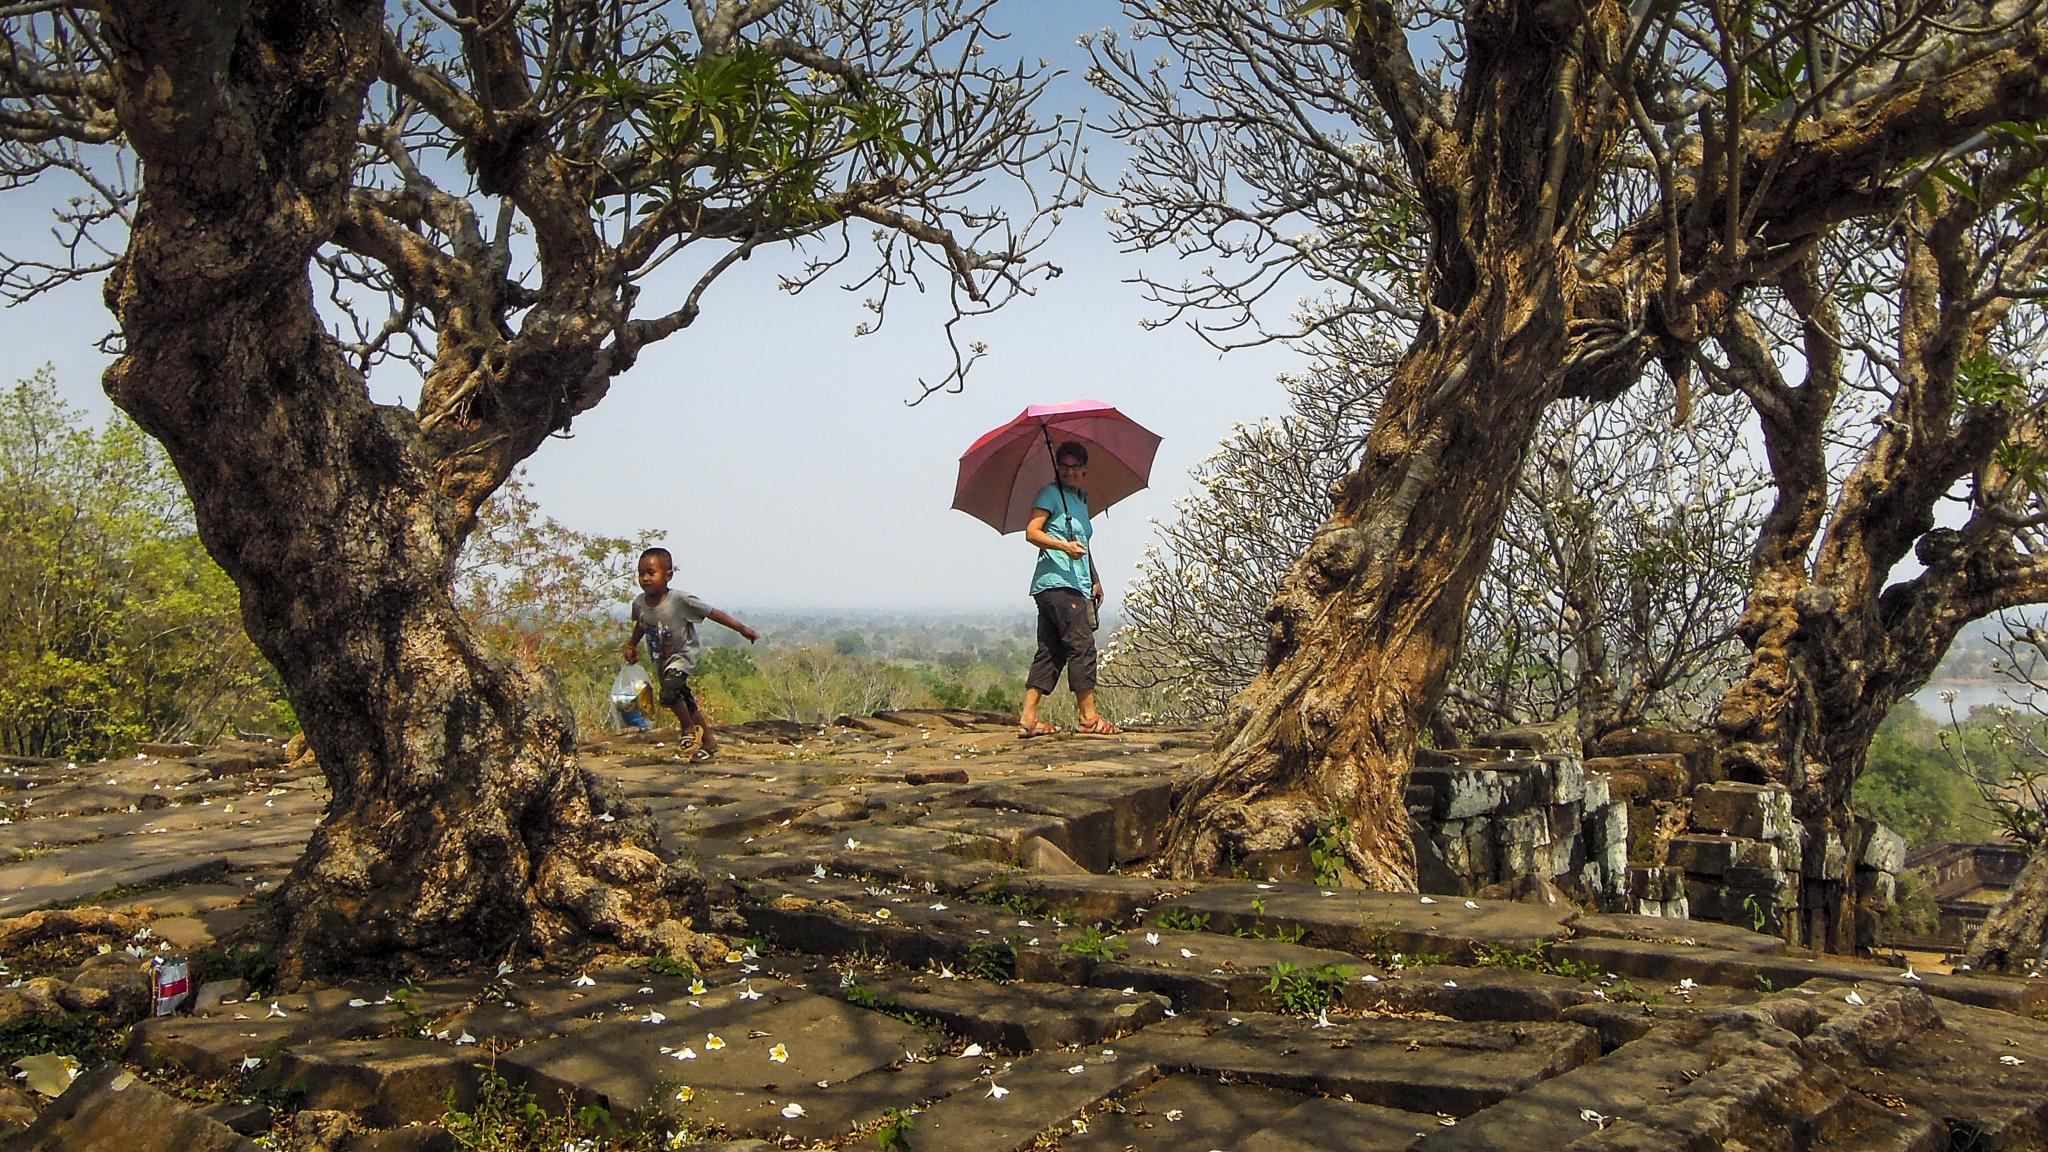 Laos What Phou Champasak Frangipani Tempelbaum Mekong Forschungs-Sabbatical organic17